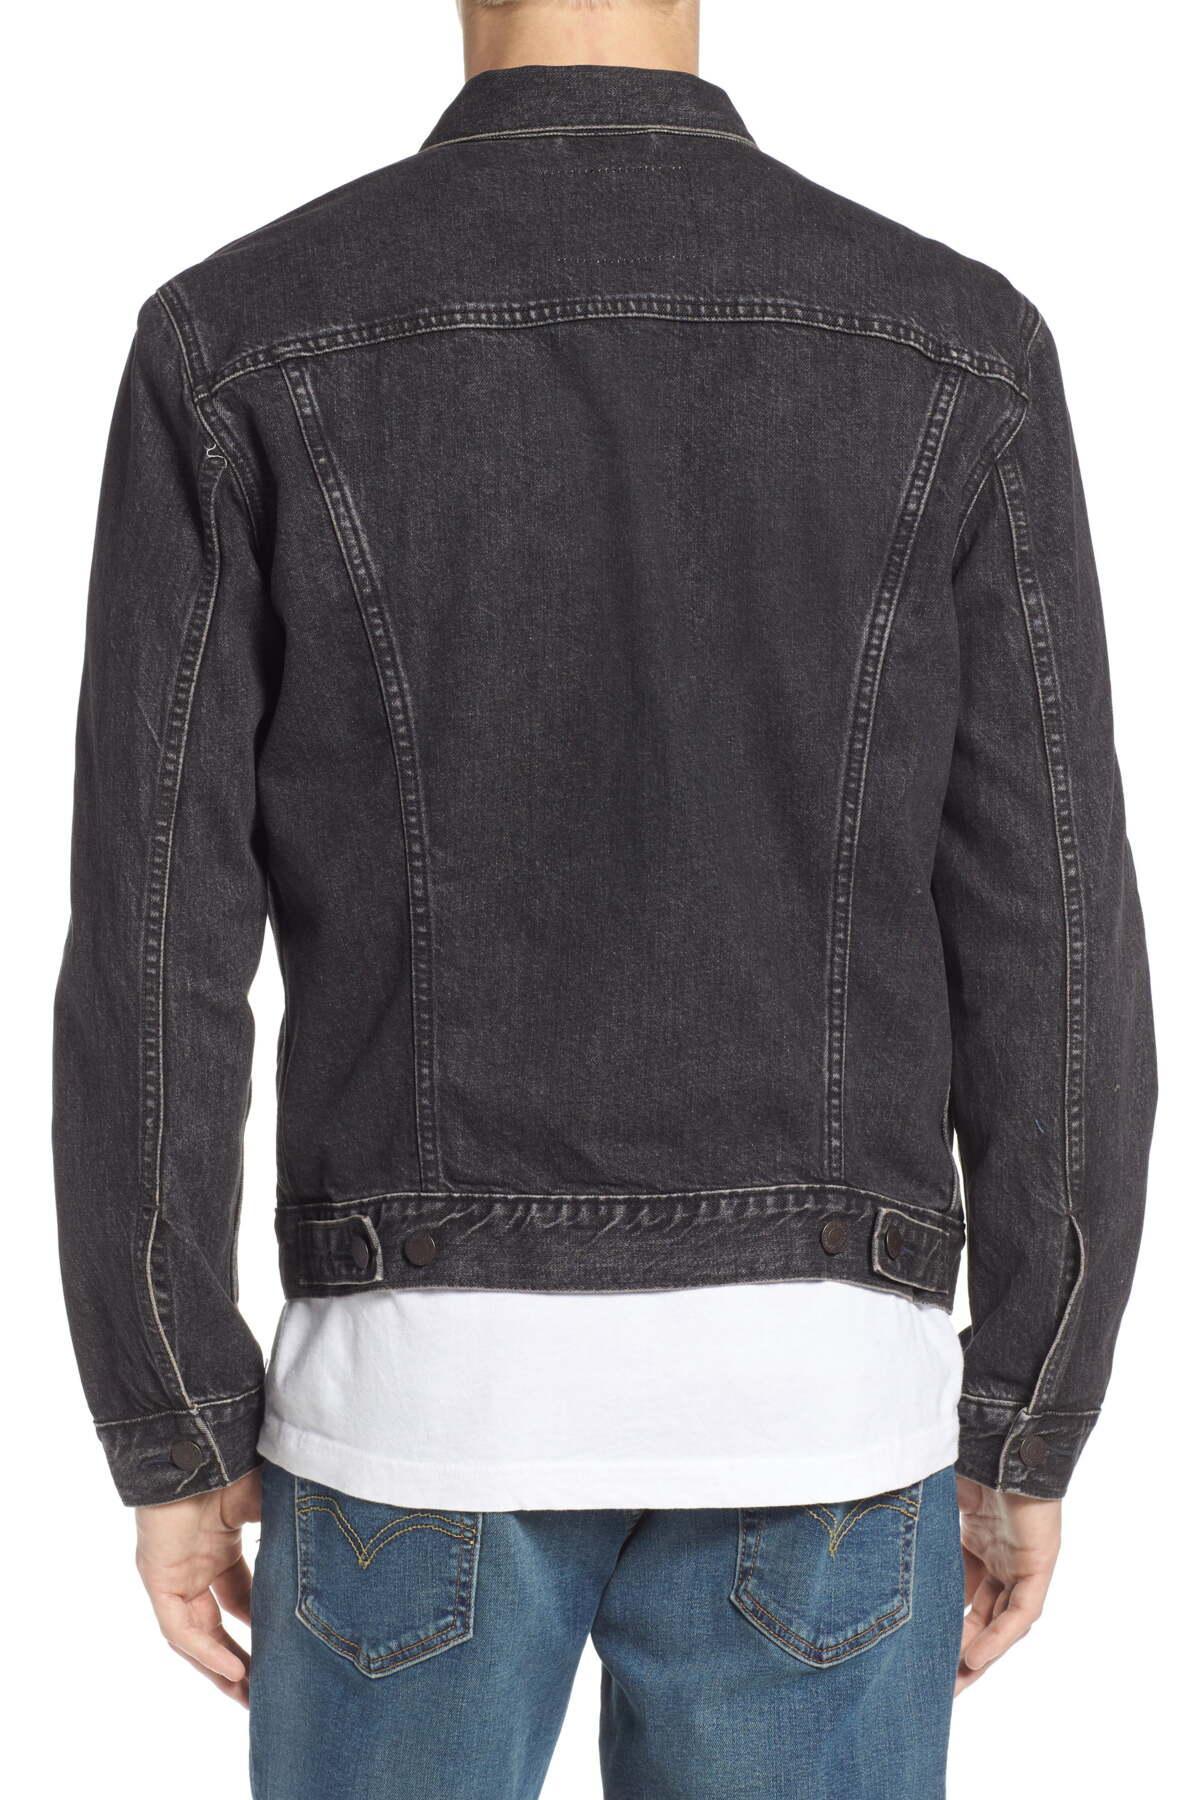 Levi's Trucker Denim Jacket in Black for Men - Lyst